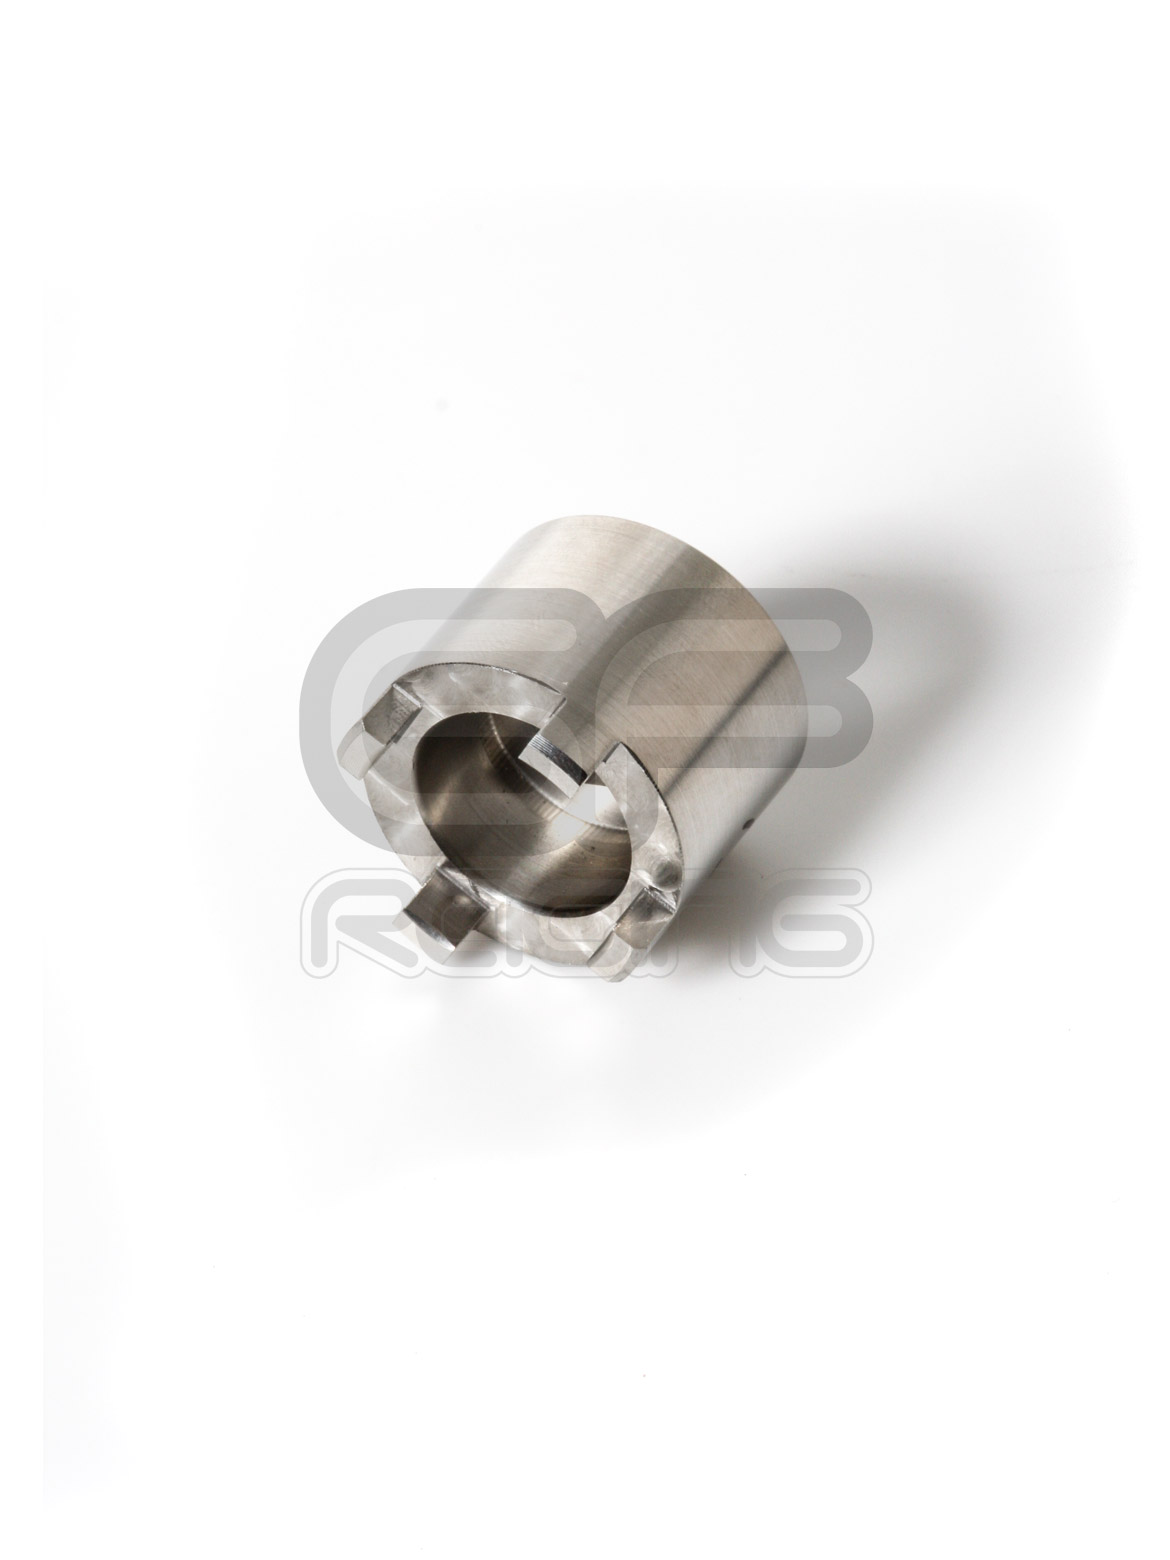 Honda CBR400 NC23 NC29 VFR400 NC30 RVF400 NC35 Clutch Nut Removal Installation Tool